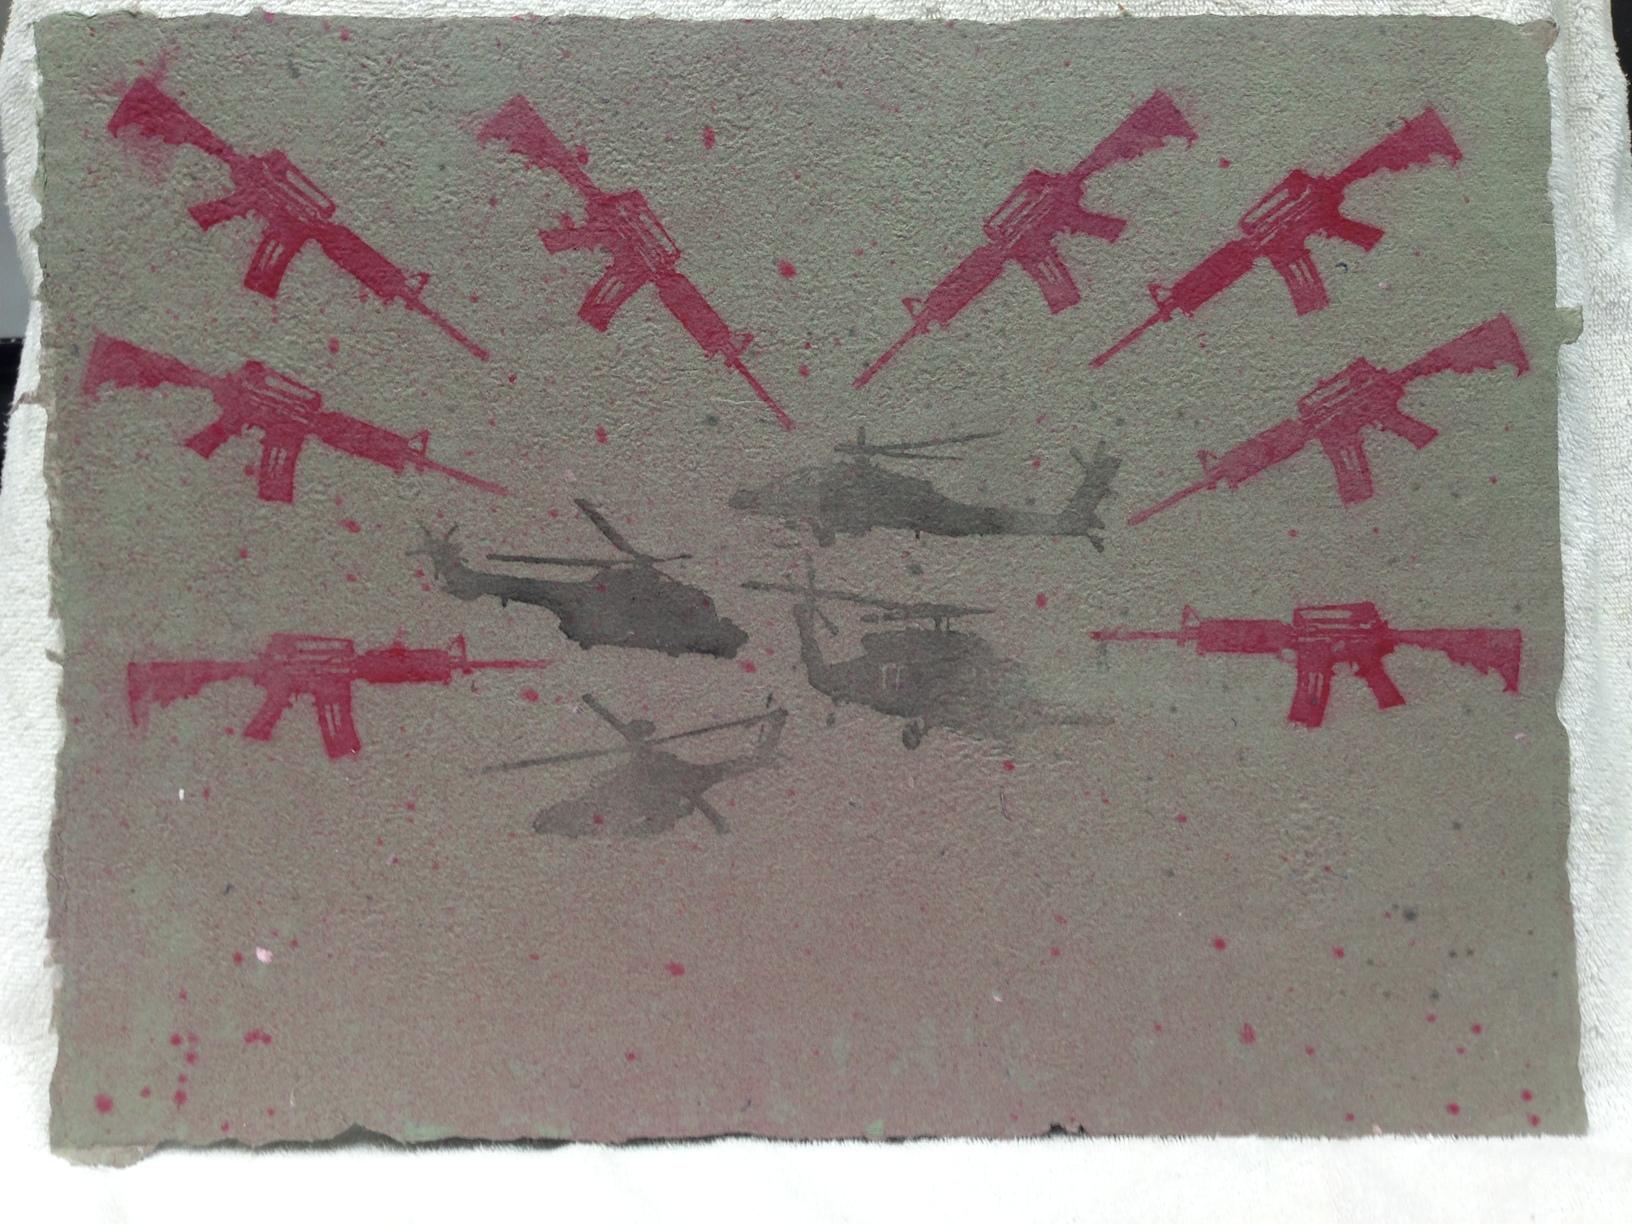 Sarah Mess Army - Somalia _Somalia_ 2013 Pulp Spray on Handmade Paper from military uniforms 15 x 20 IMG_1040JPG.jpg